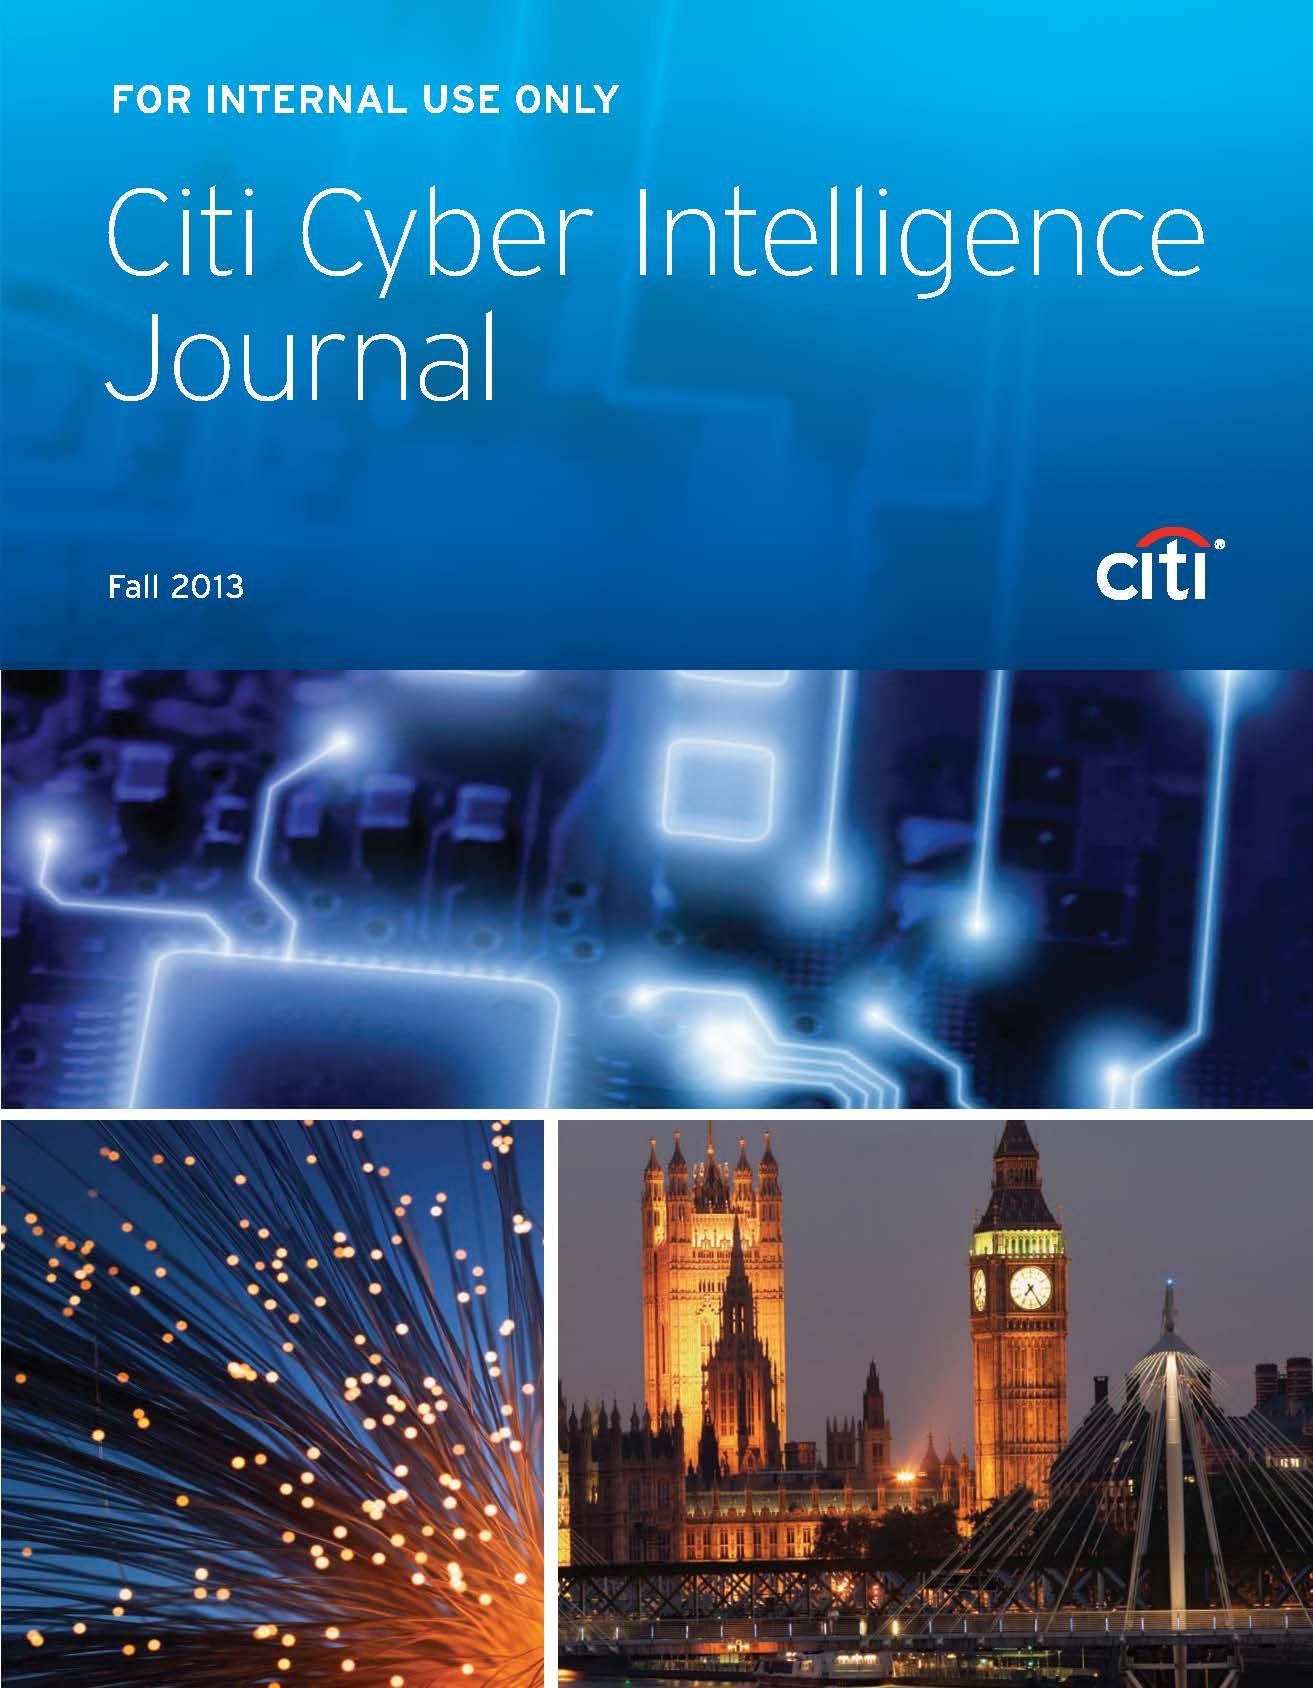 1094887_Citi_Cyber_Intelligence_Journal_FINALPRINT_9.30._sm_Page_001.jpg